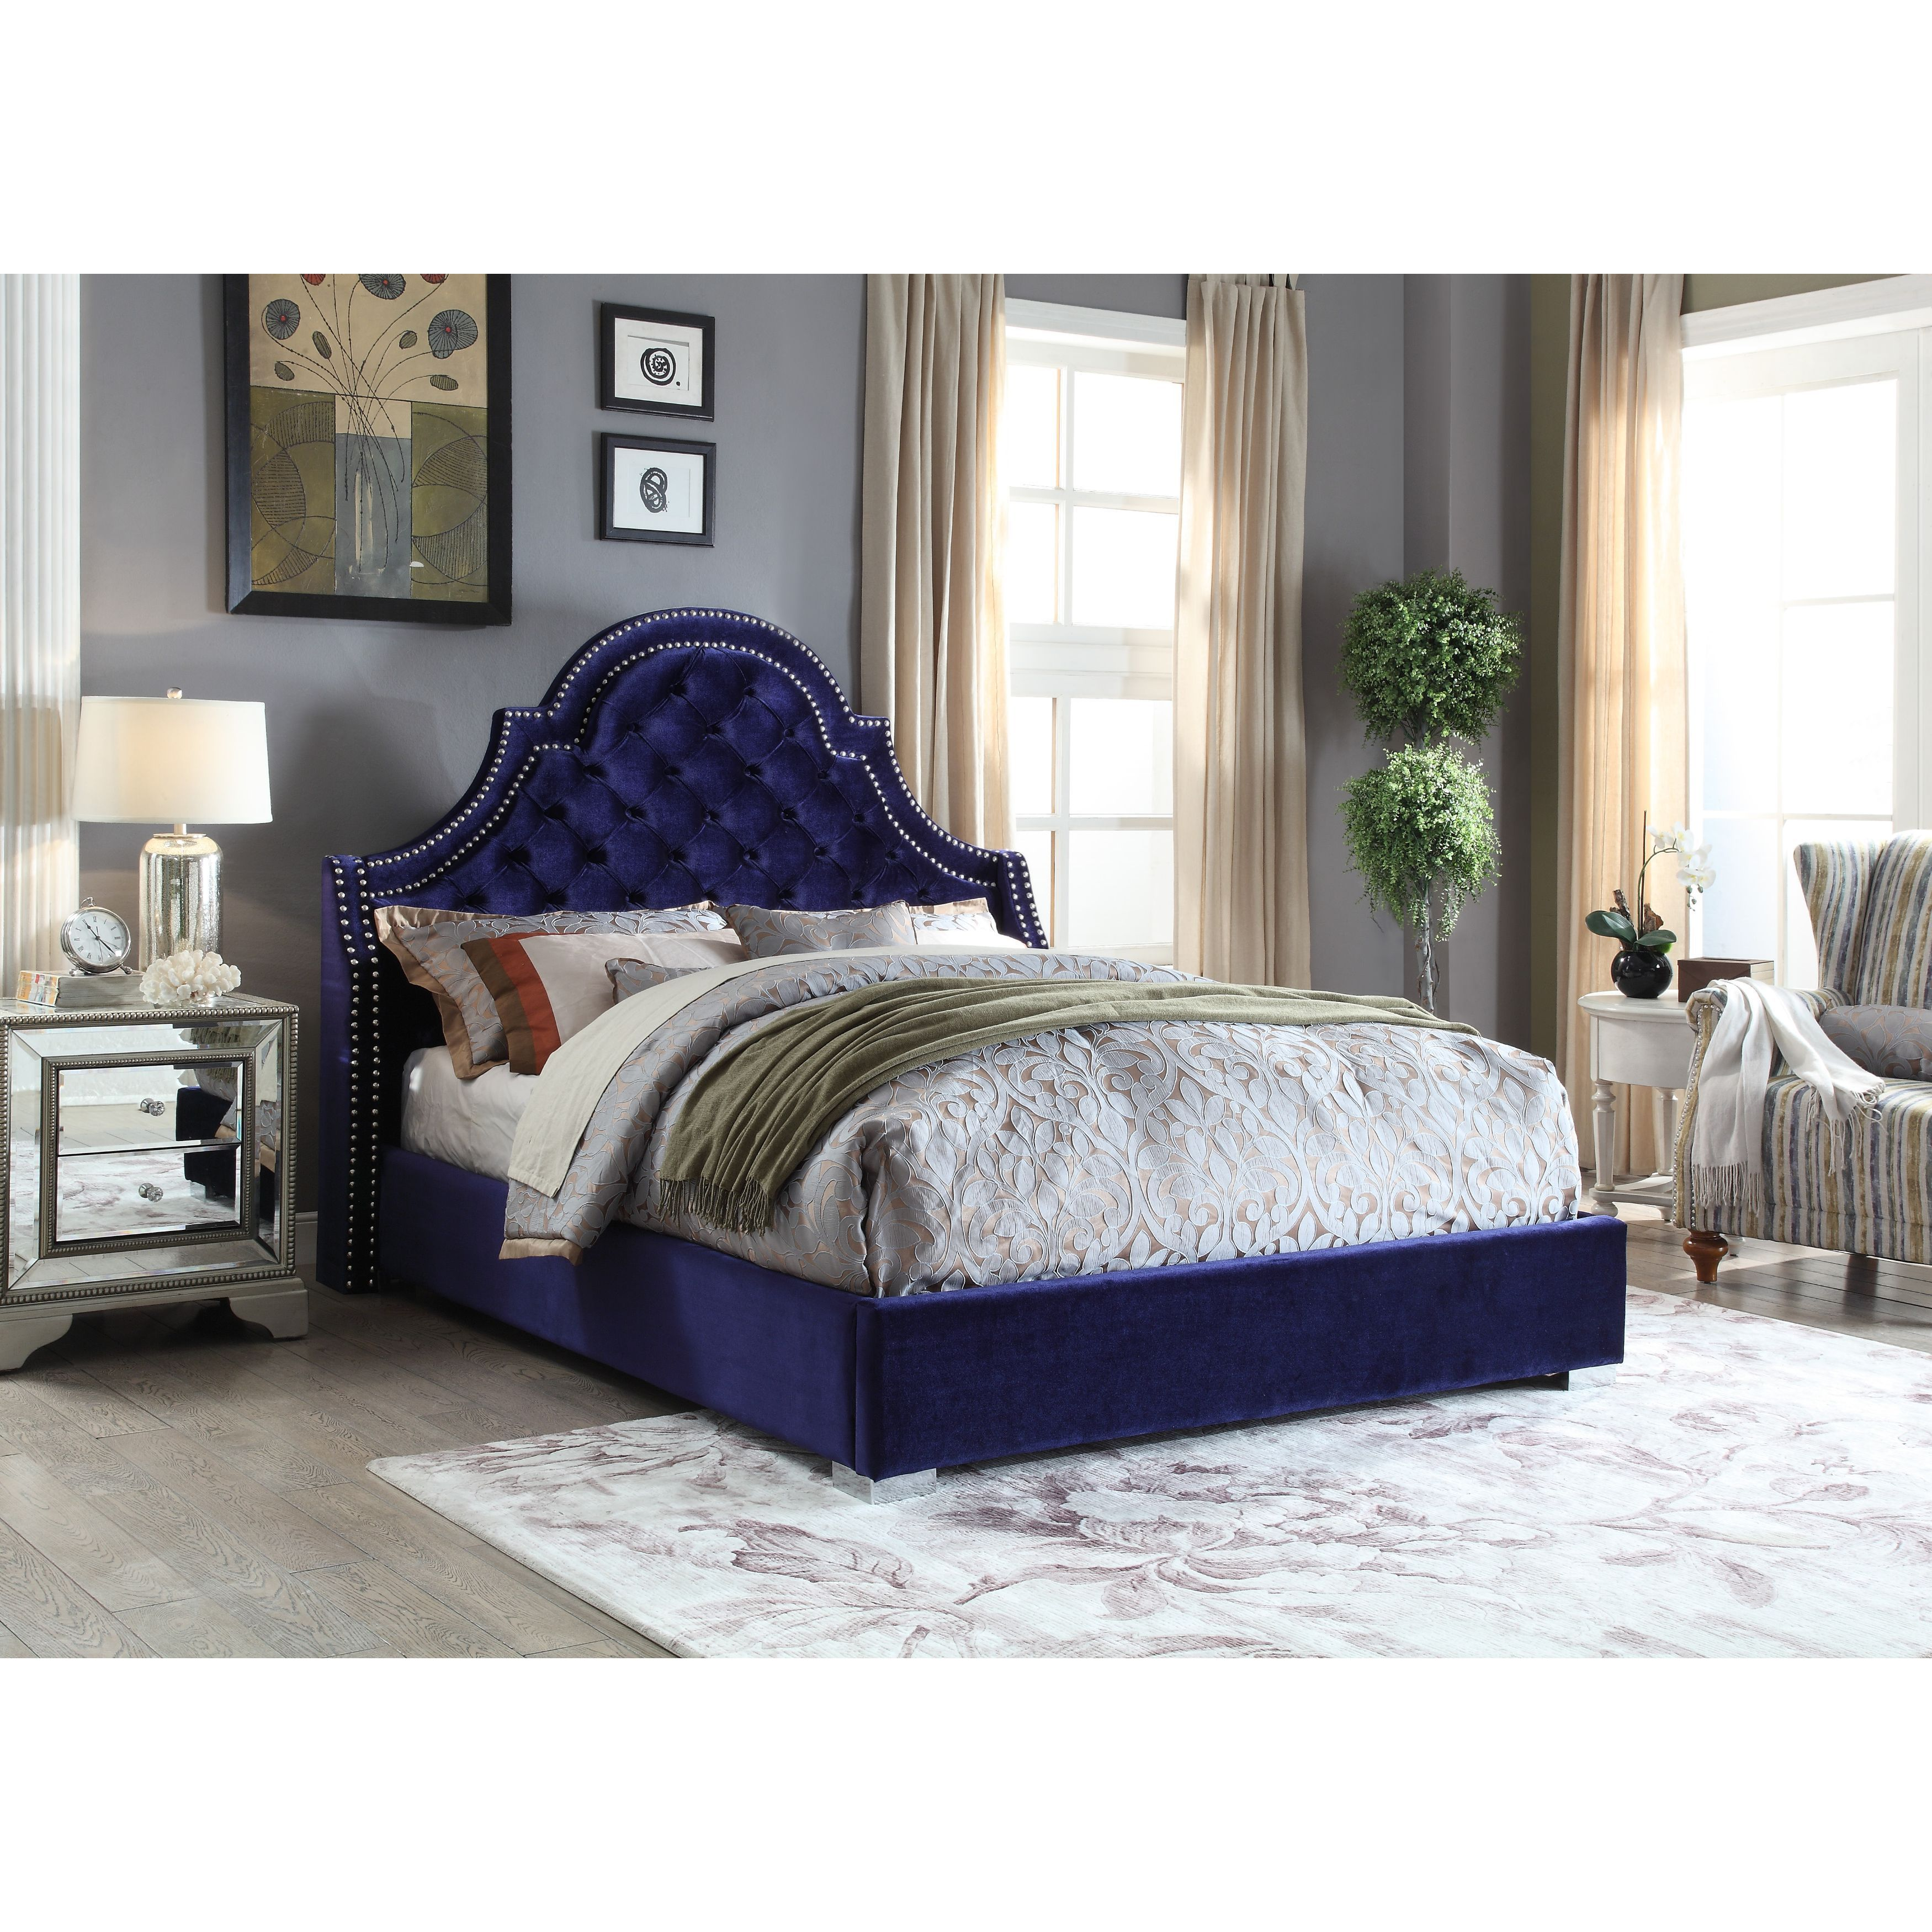 Meridian Madison Navy Velvet Bed - Free Shipping Today - Overstock ...